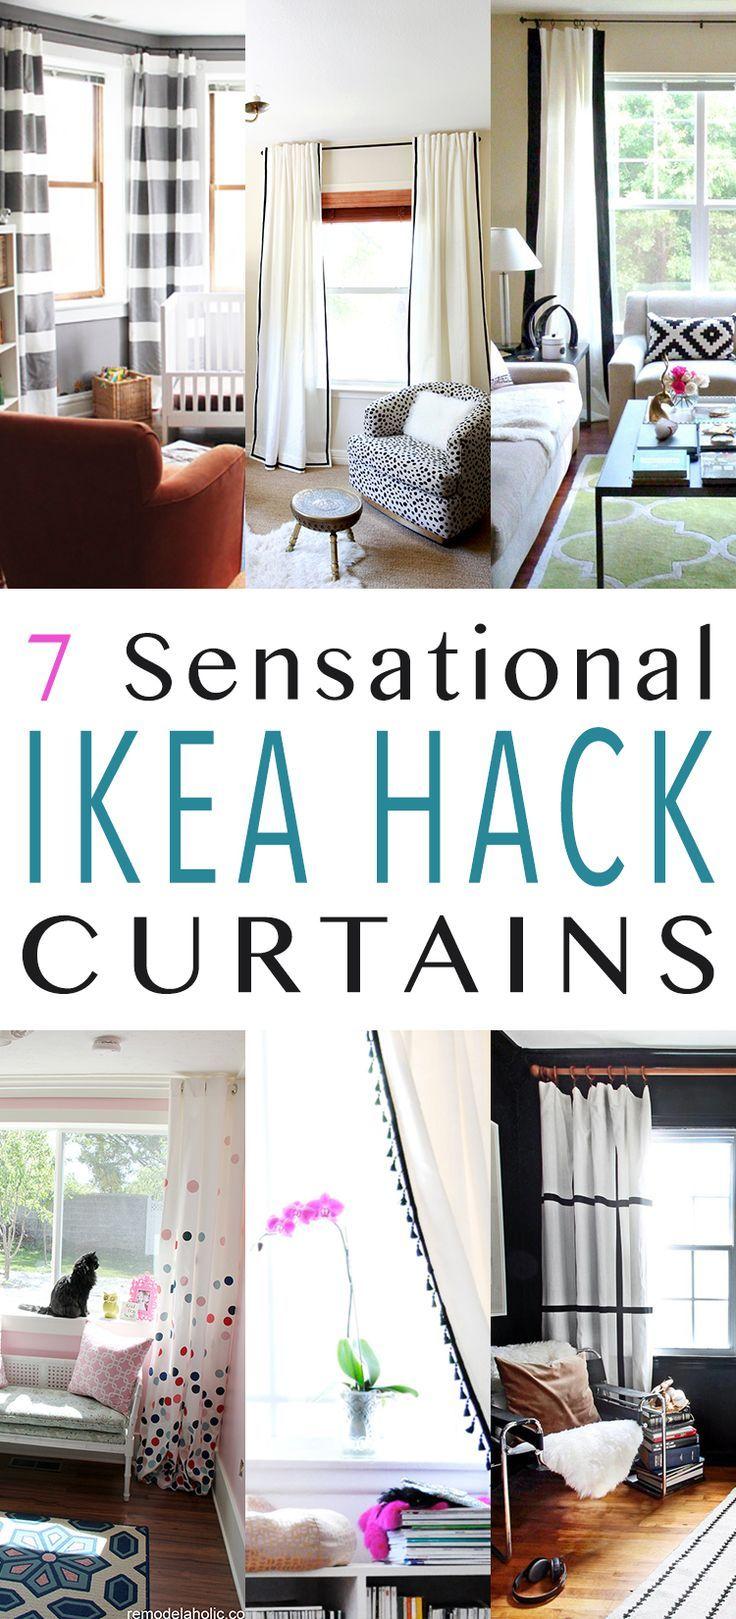 7 Sensational Curtain Ikea Hacks Diy Curtains Ikea Hack